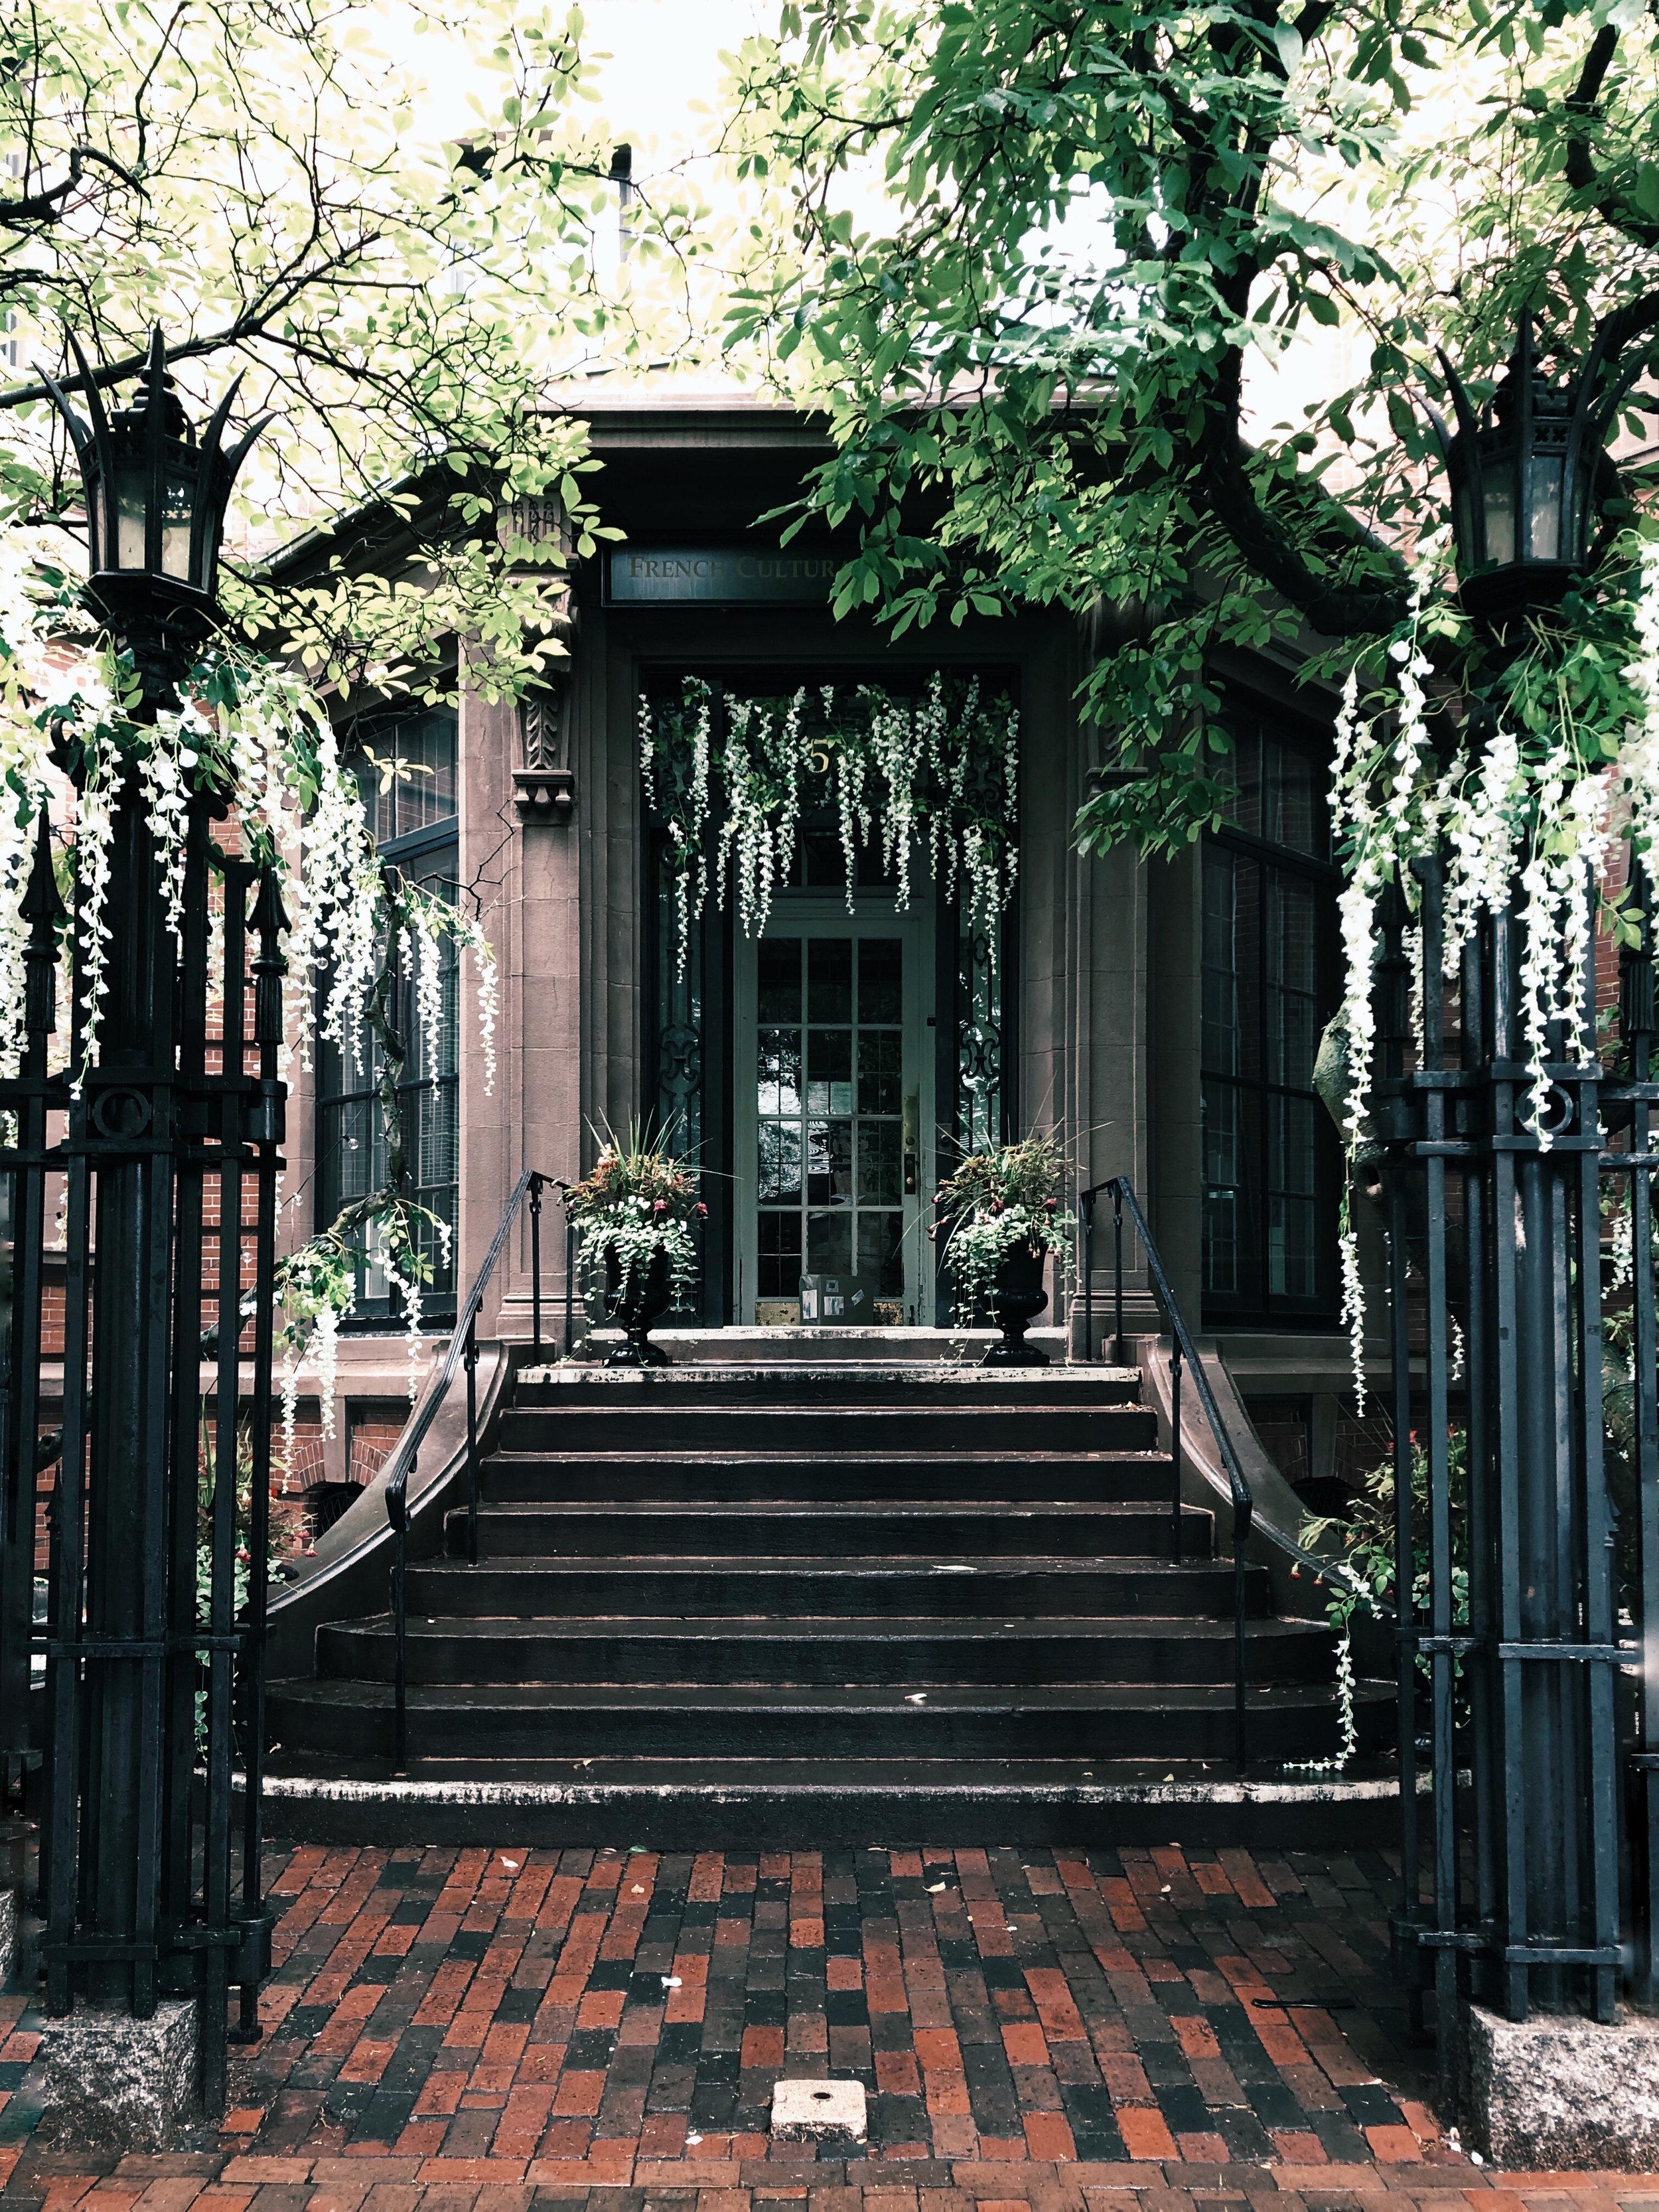 @ducklasagne - French Cultural Center, Boston, MA